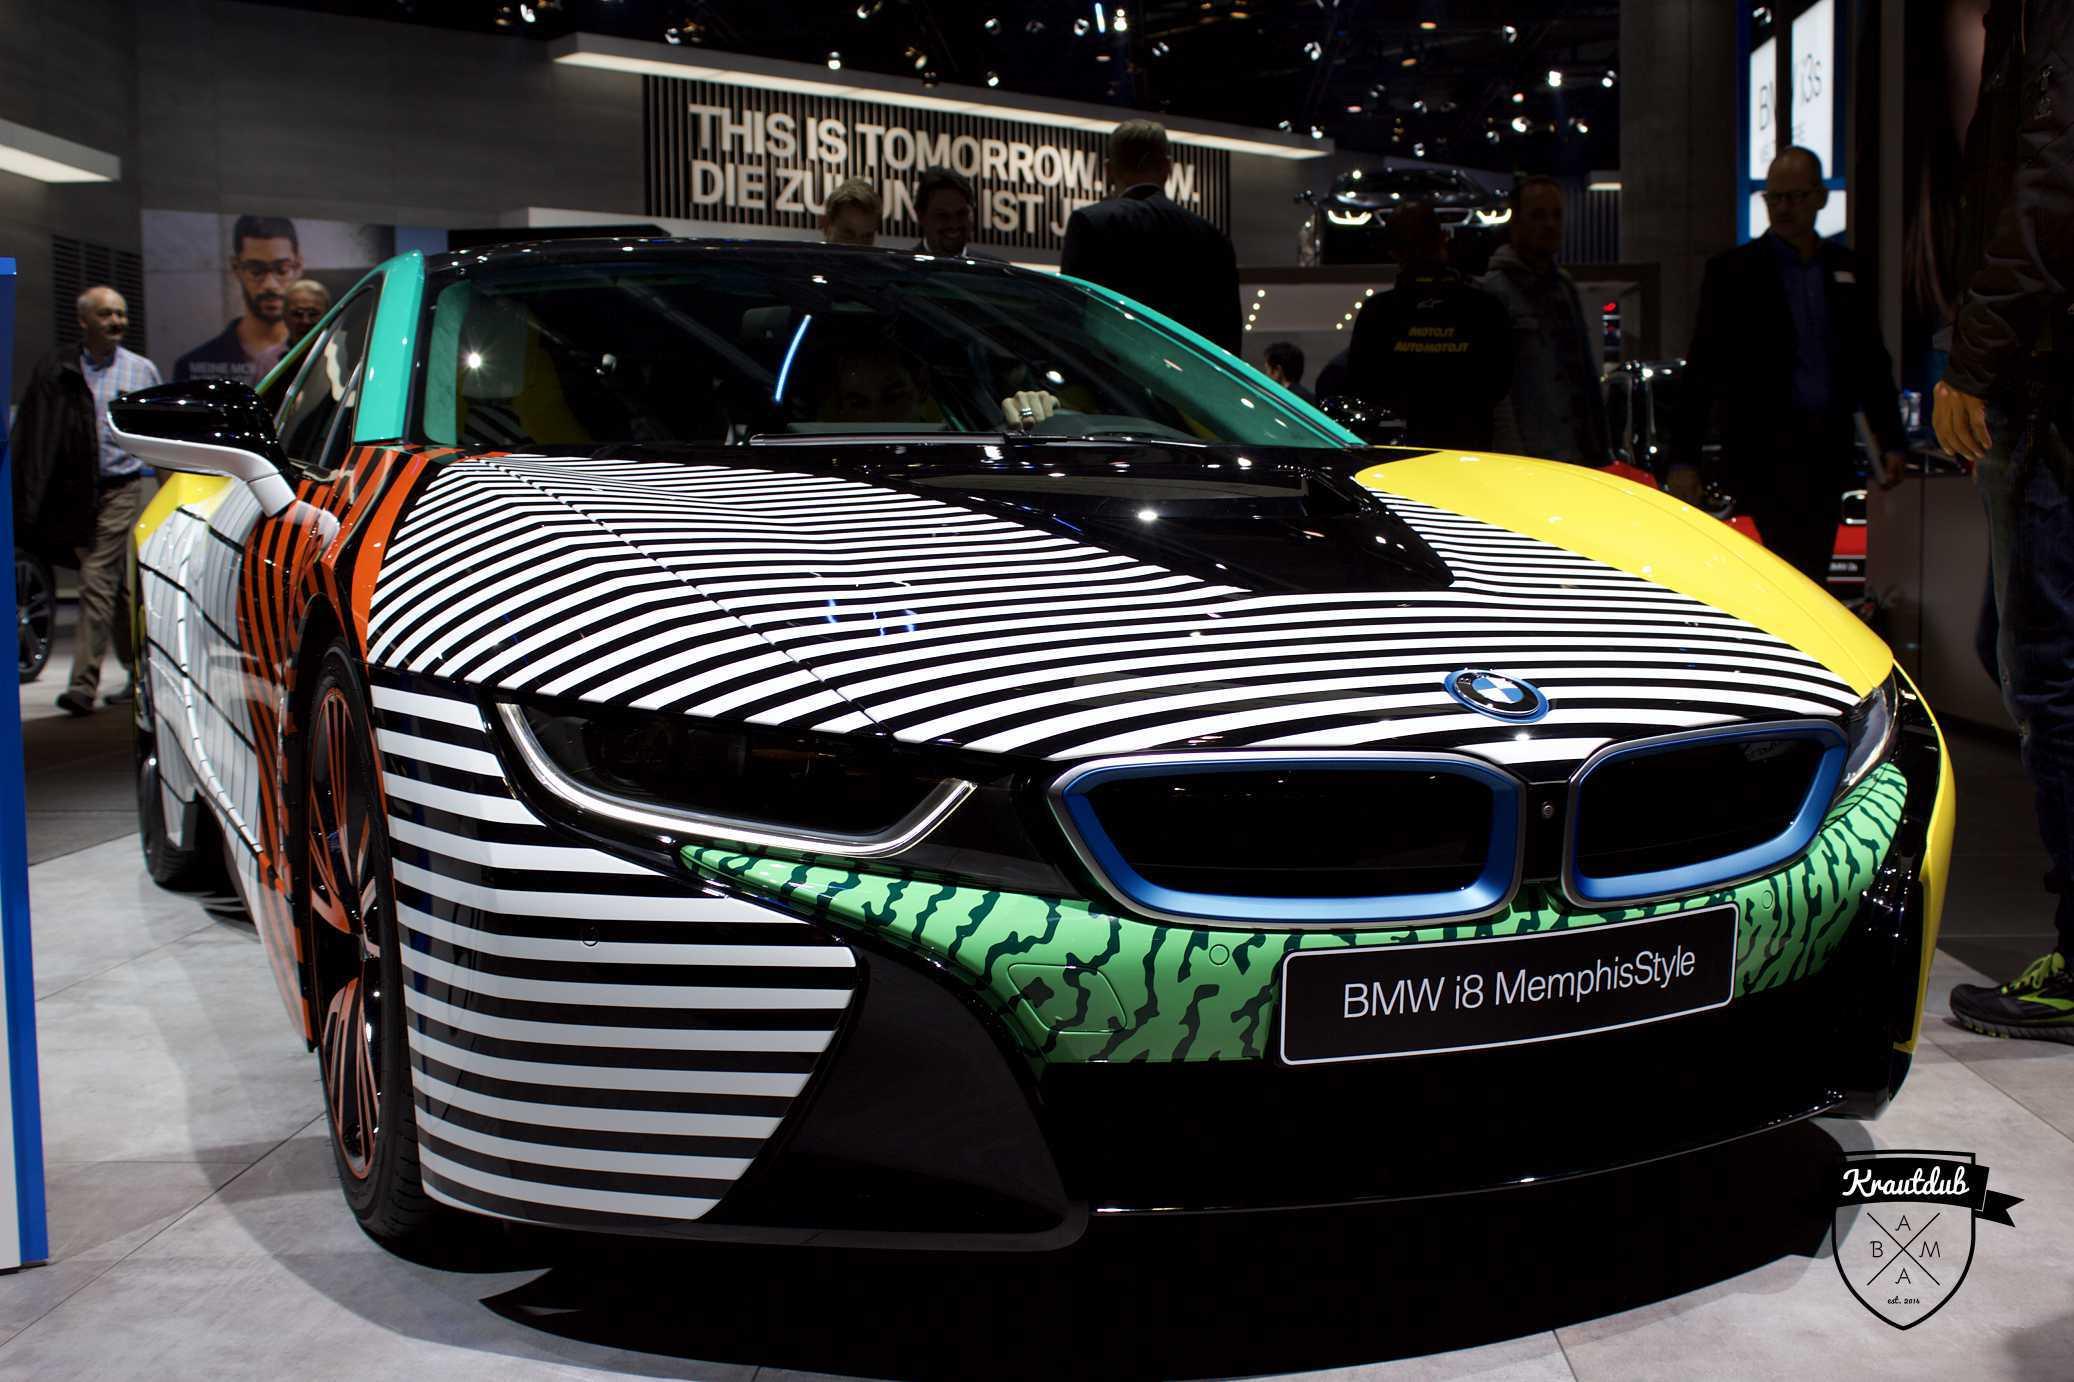 BMW i8 MemphisStyle - IAA 2017